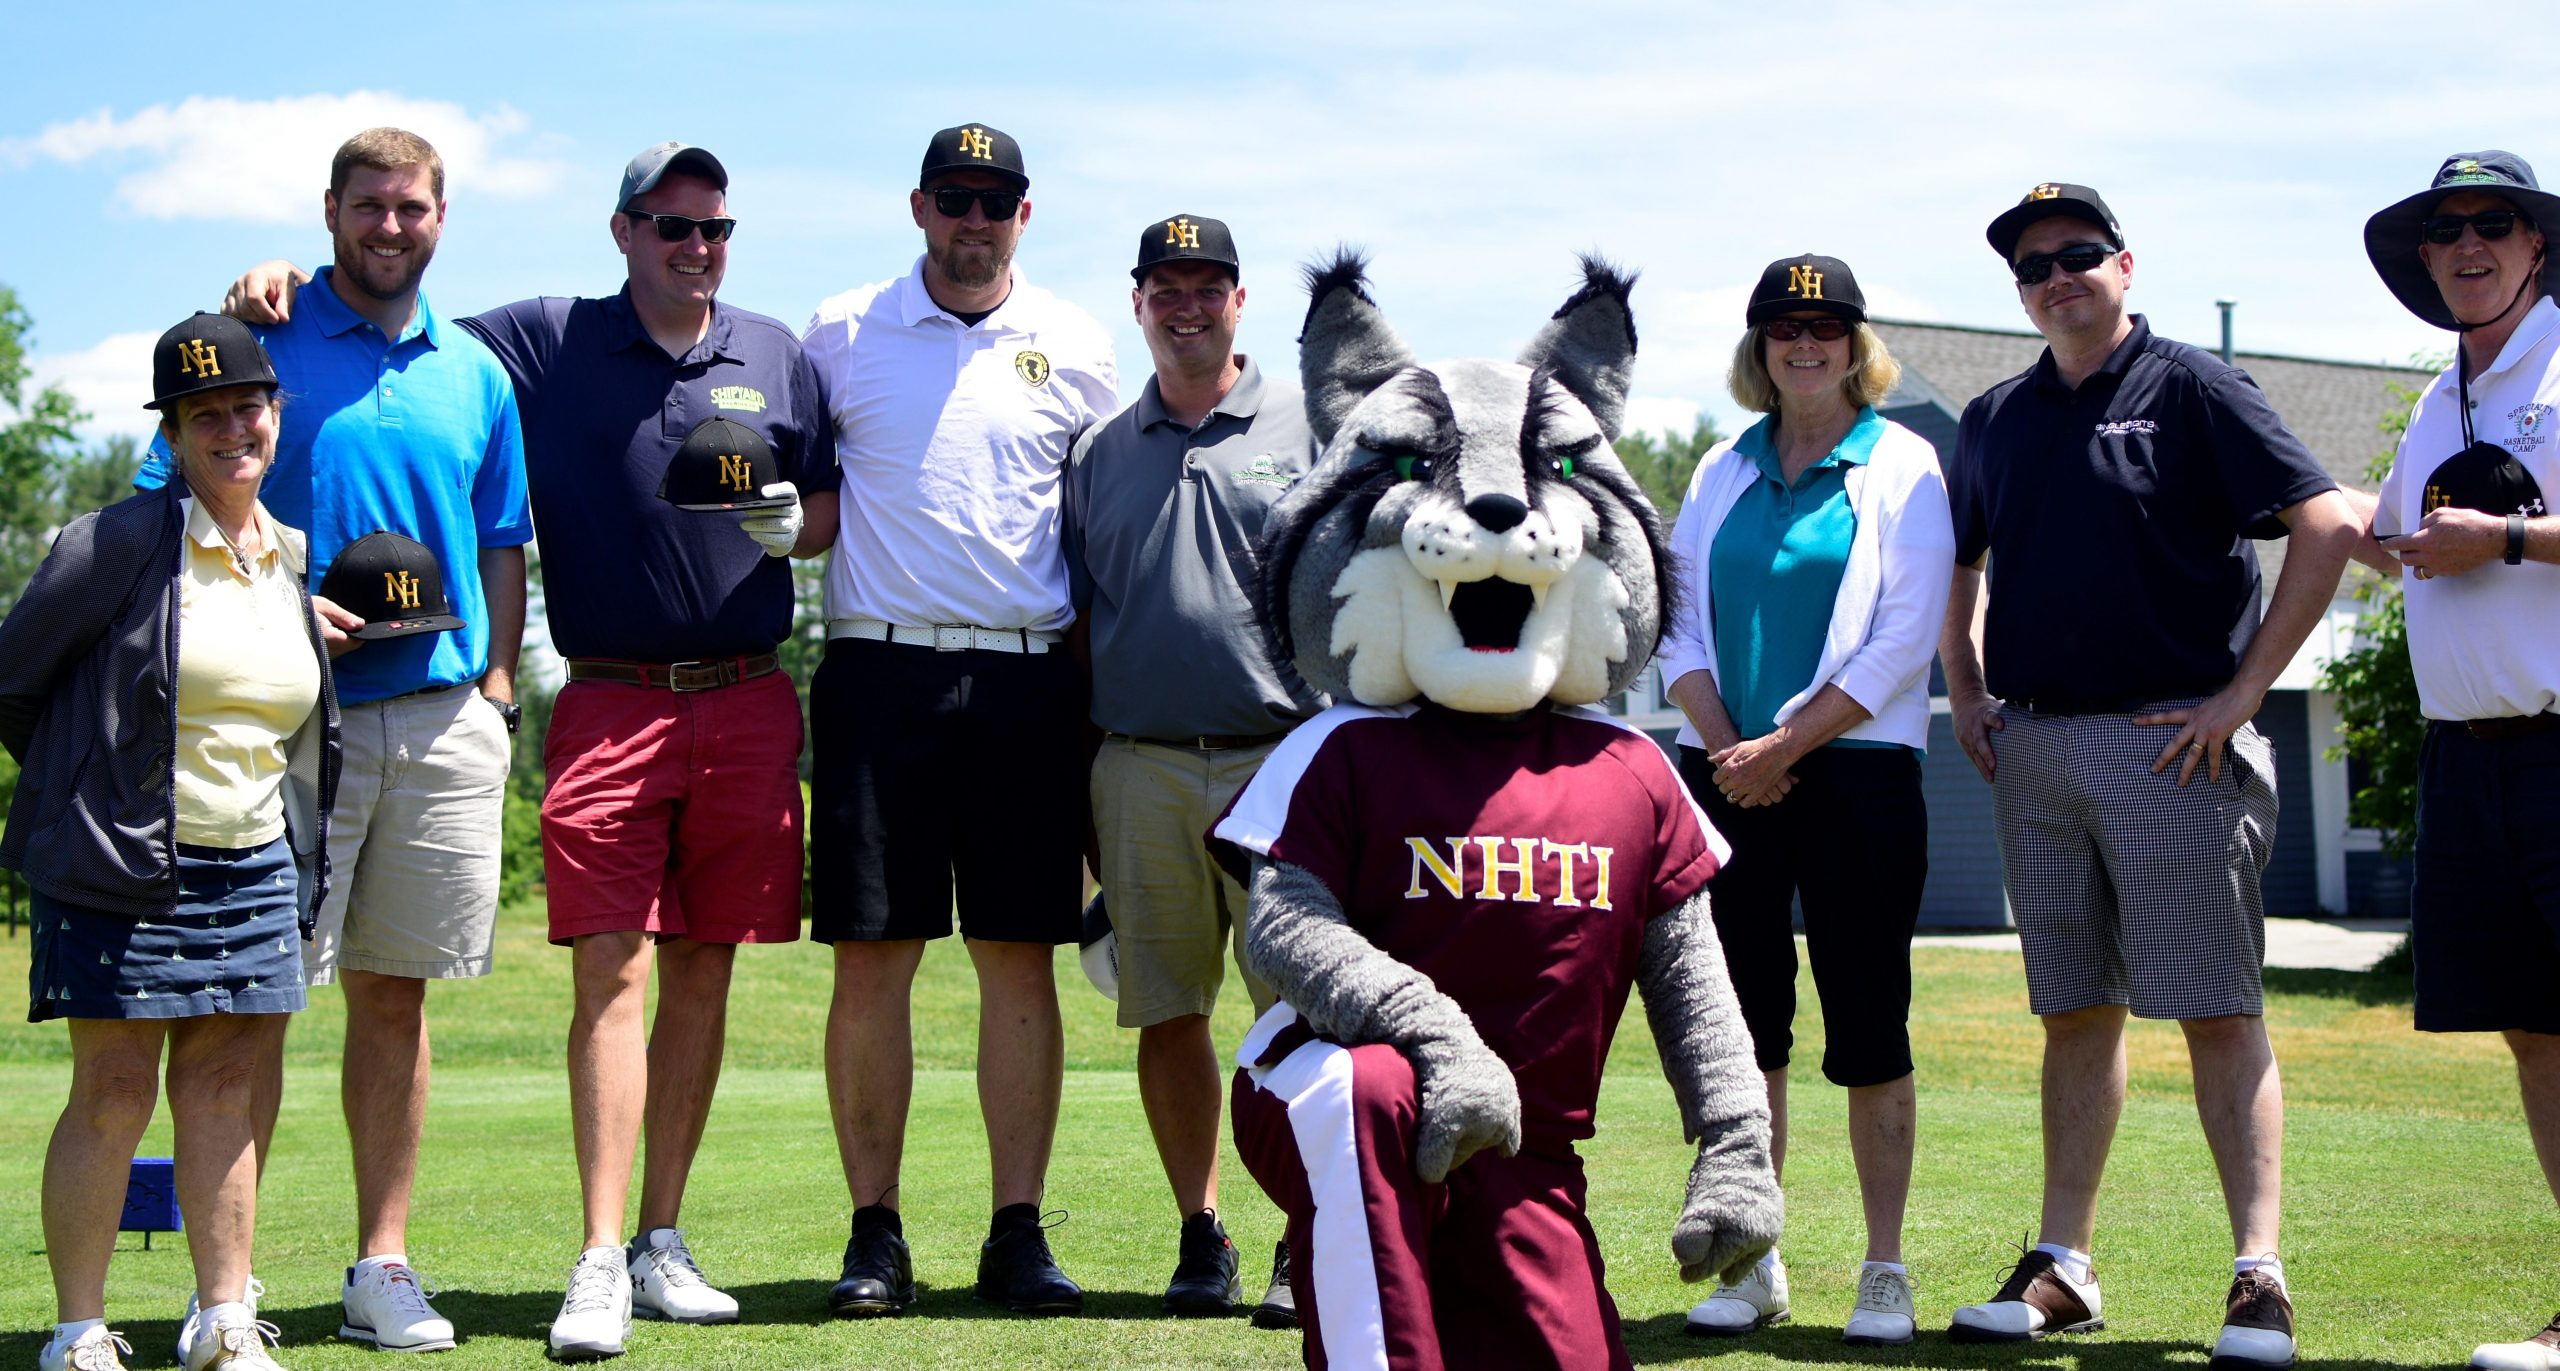 NHTI Lynx Golf Series @ Loudon Country Club - August 24, 2021